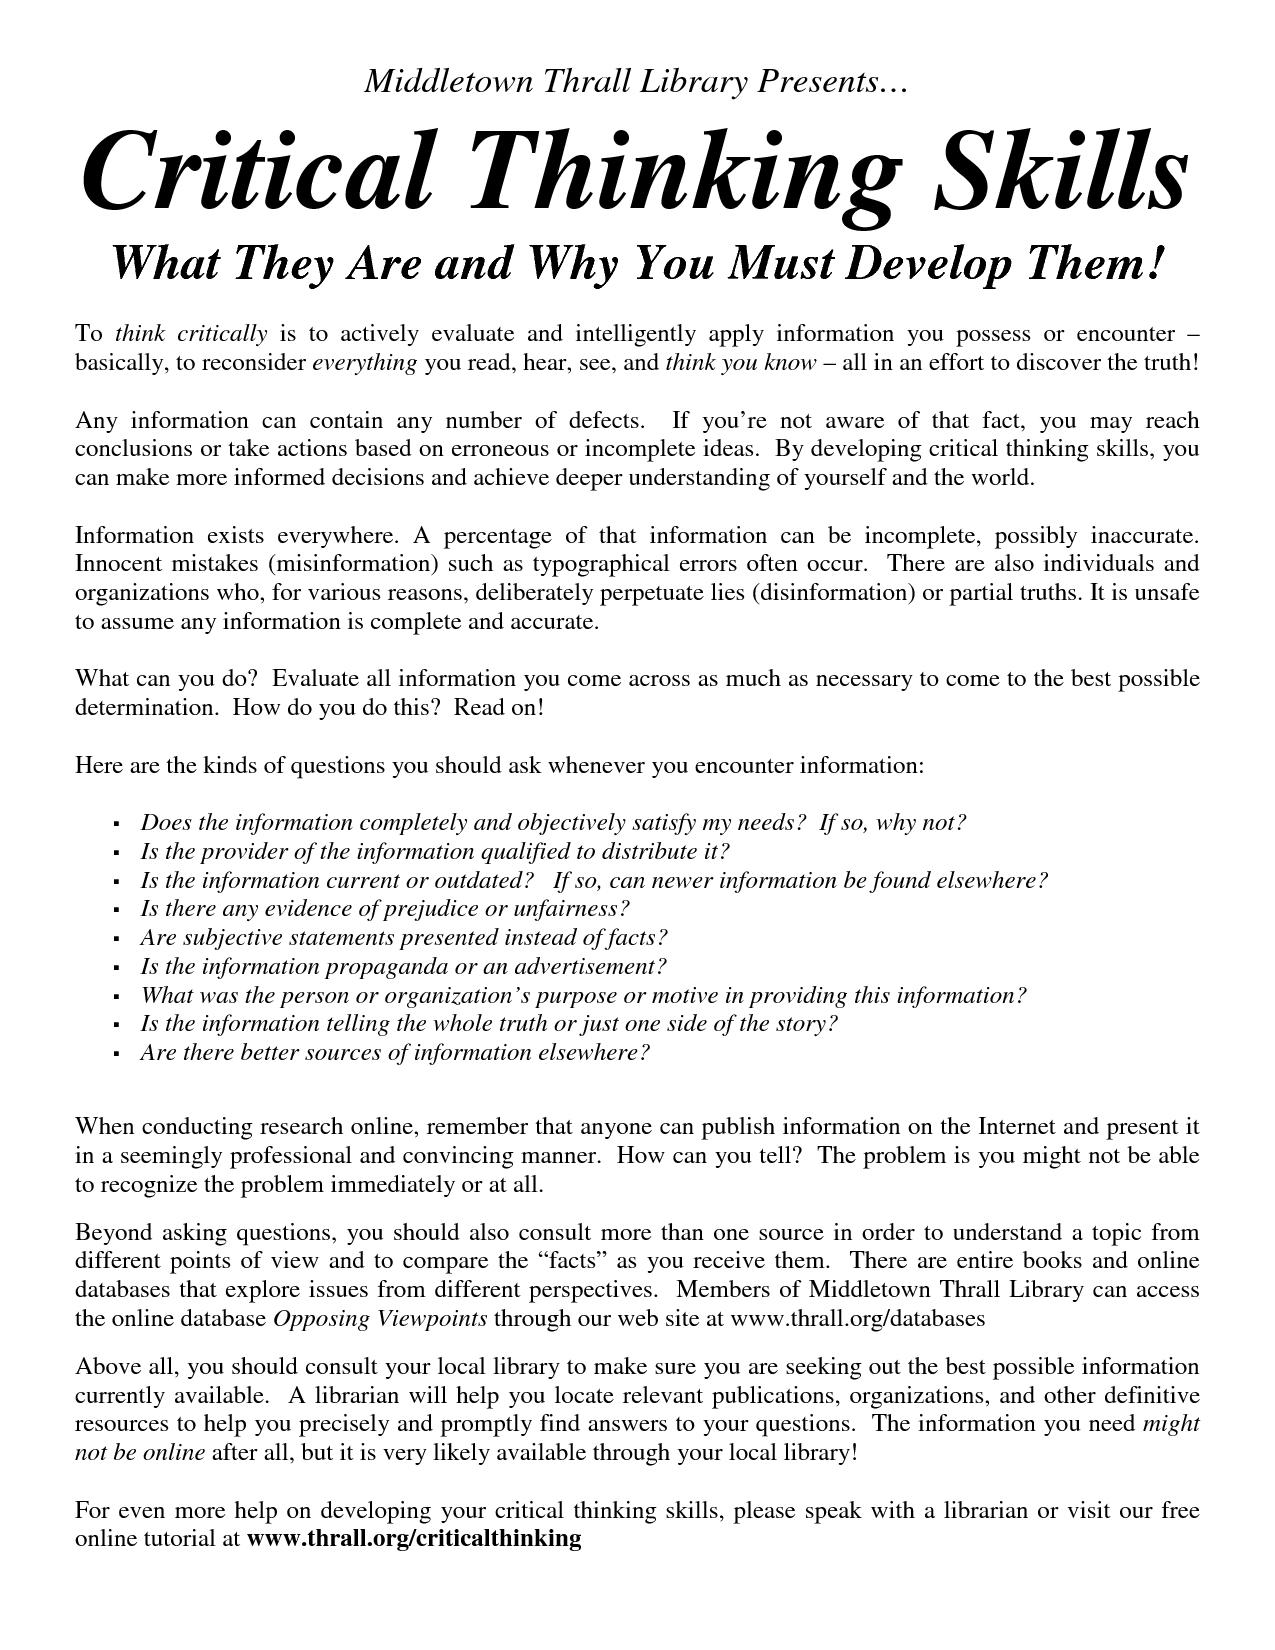 Essay on critical thinking skills